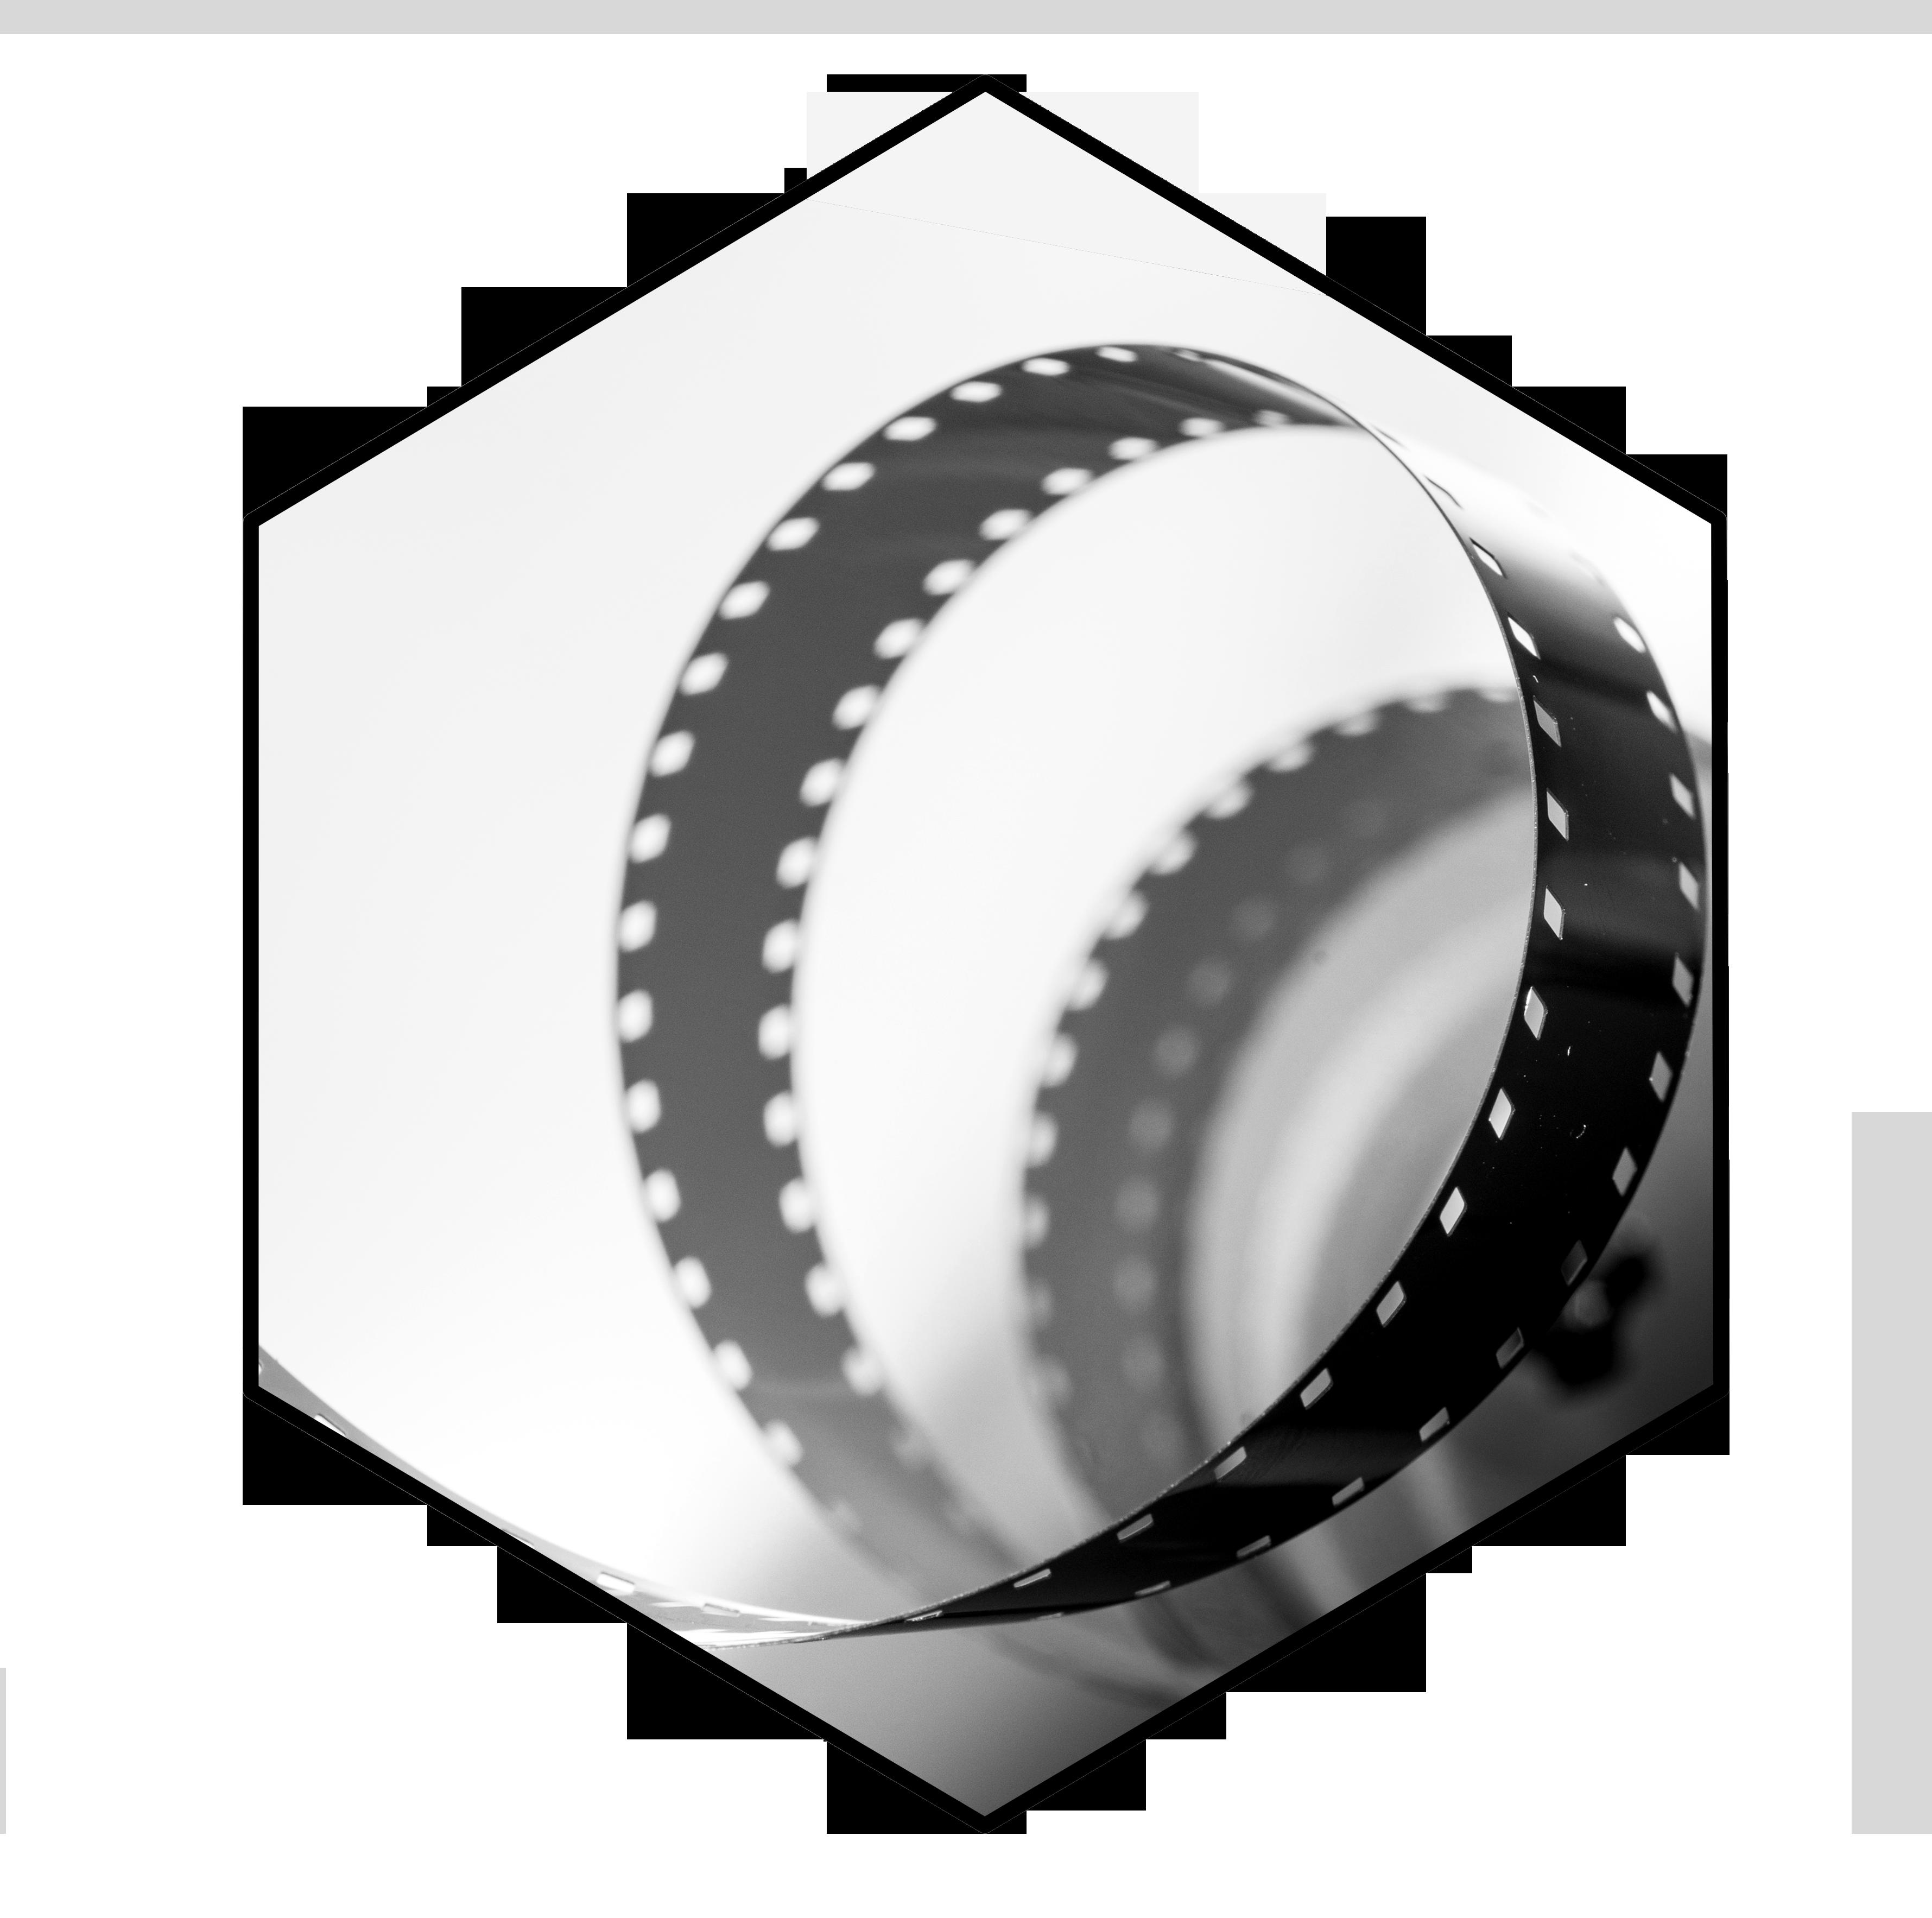 POST-PRODUCTION HD EDITING